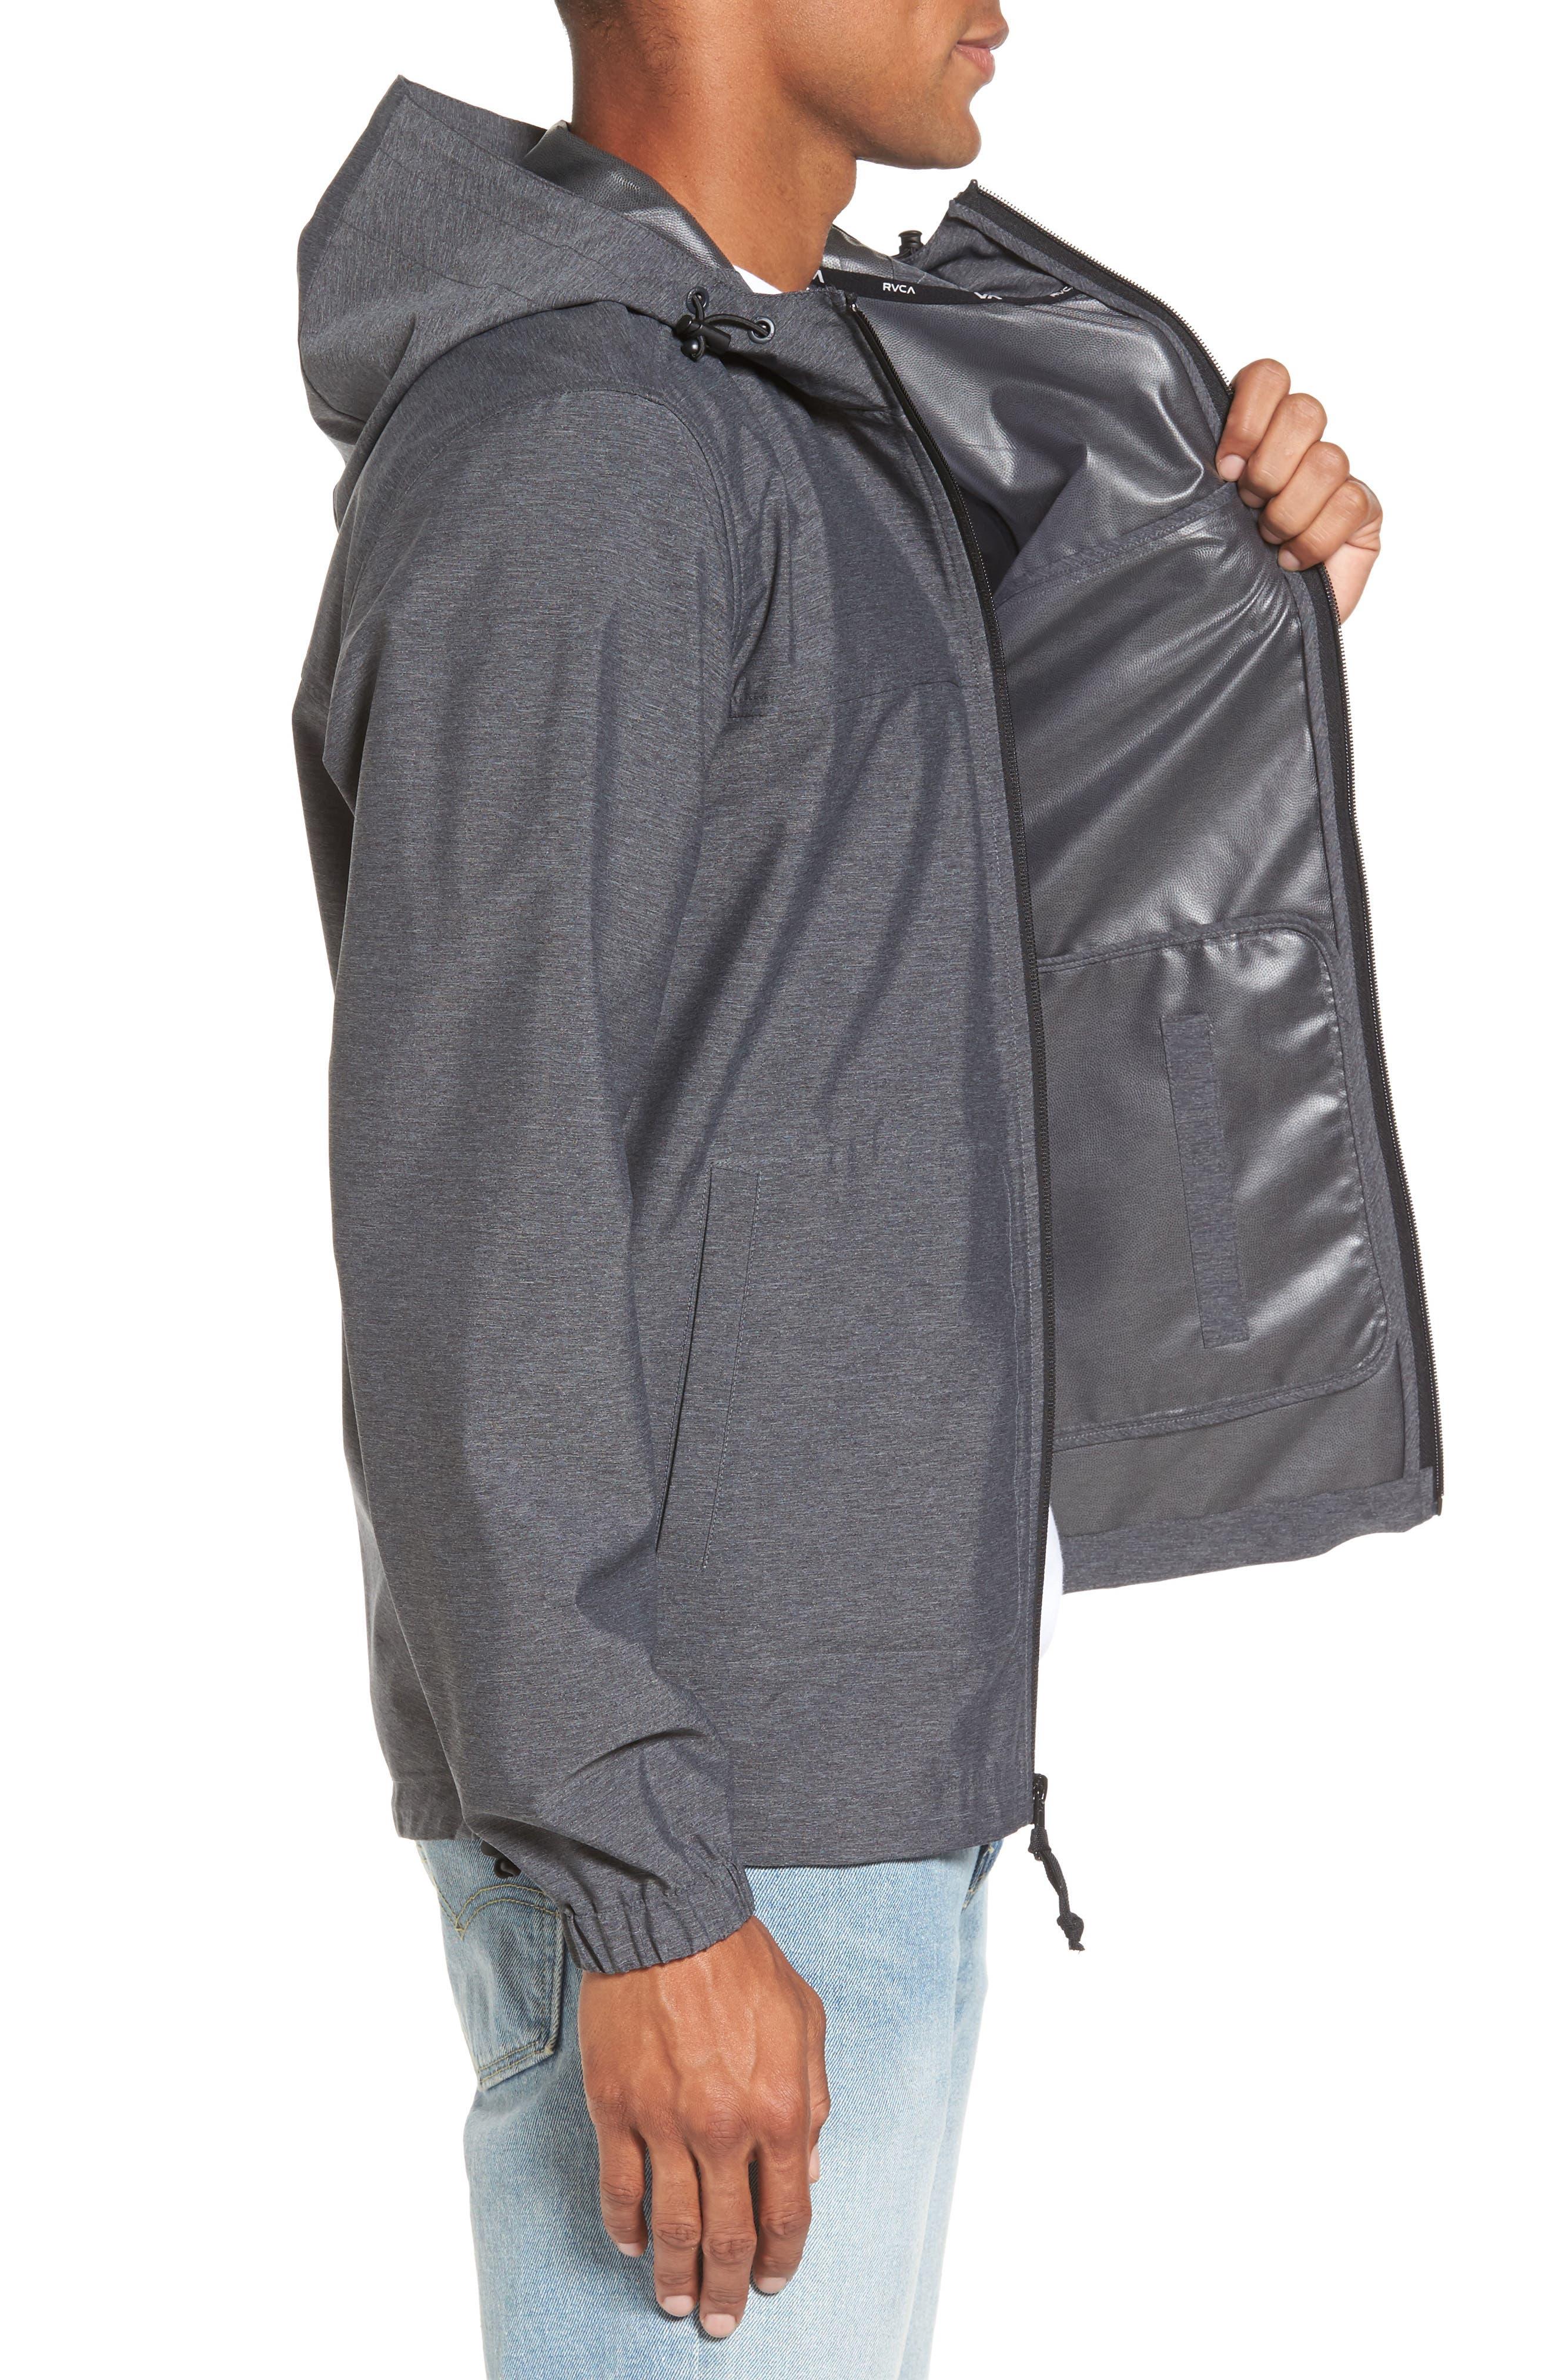 Steep Sport Jacket,                             Alternate thumbnail 3, color,                             008